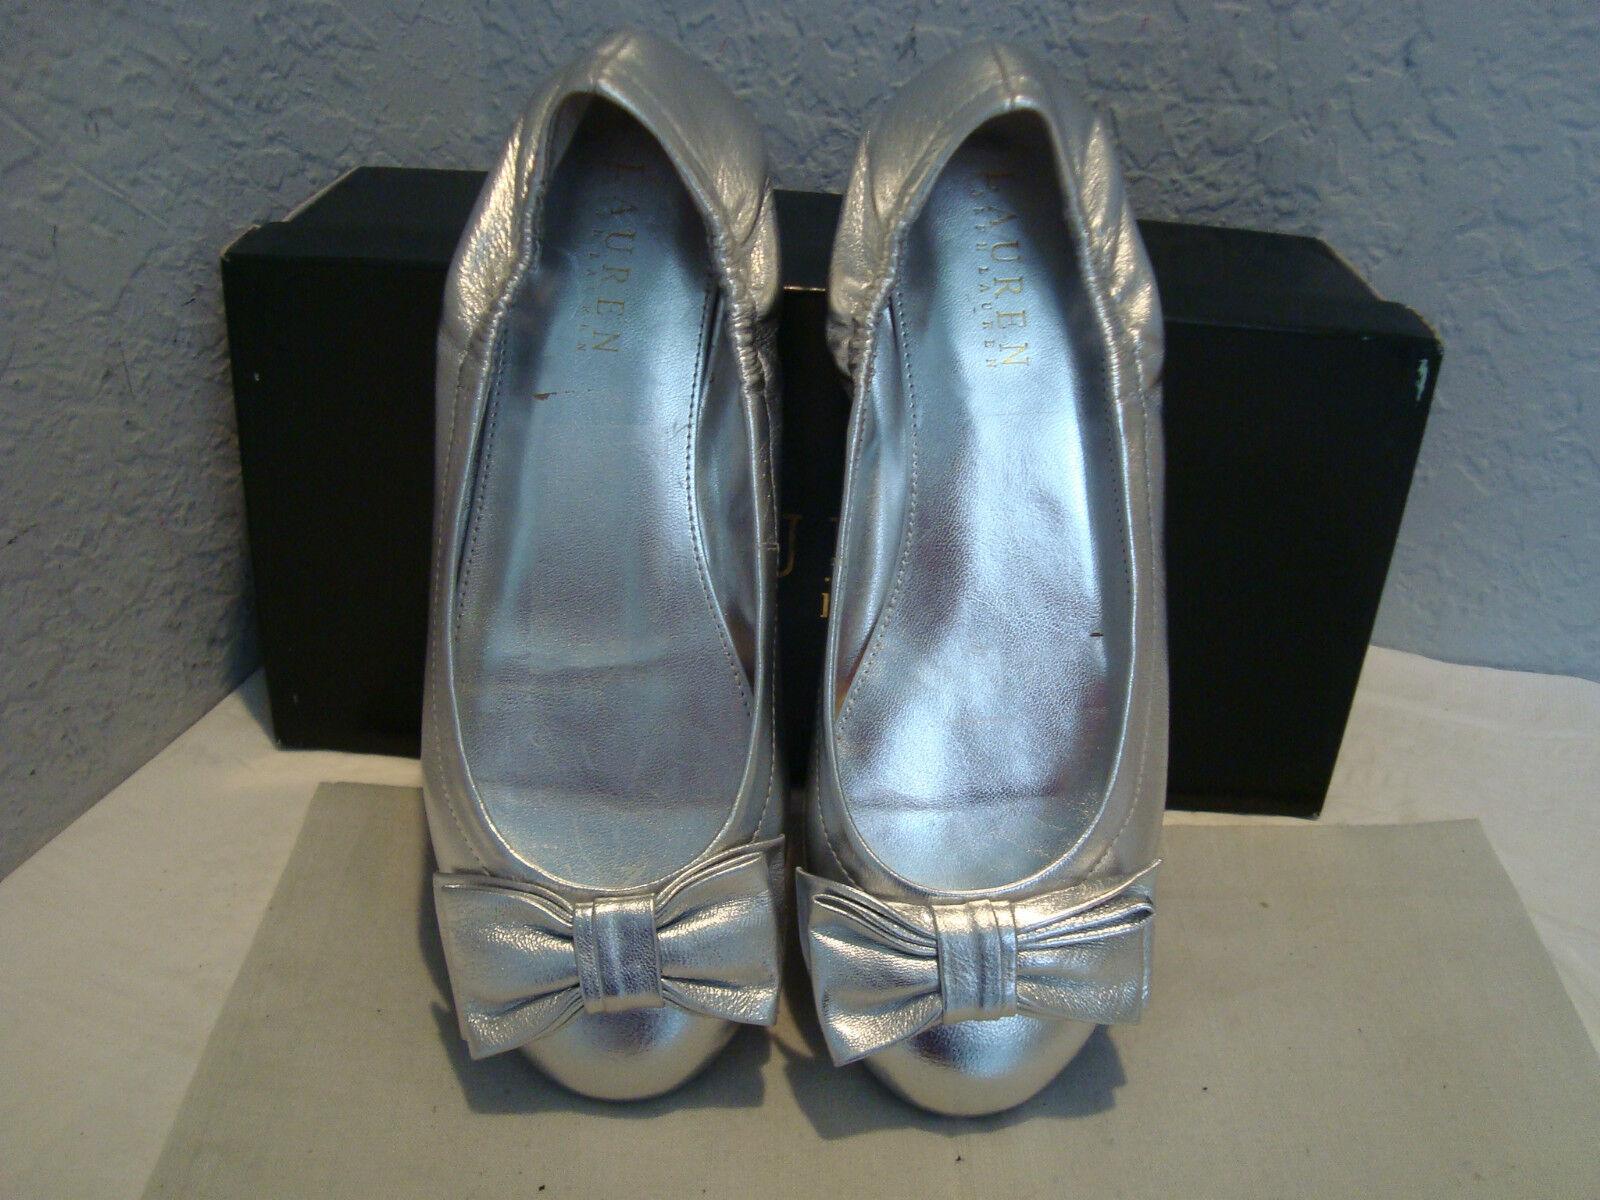 NEU Lauren Ralph Lauren Evelia Vintage Silver Grained Metallic Schuhes 5.5 B